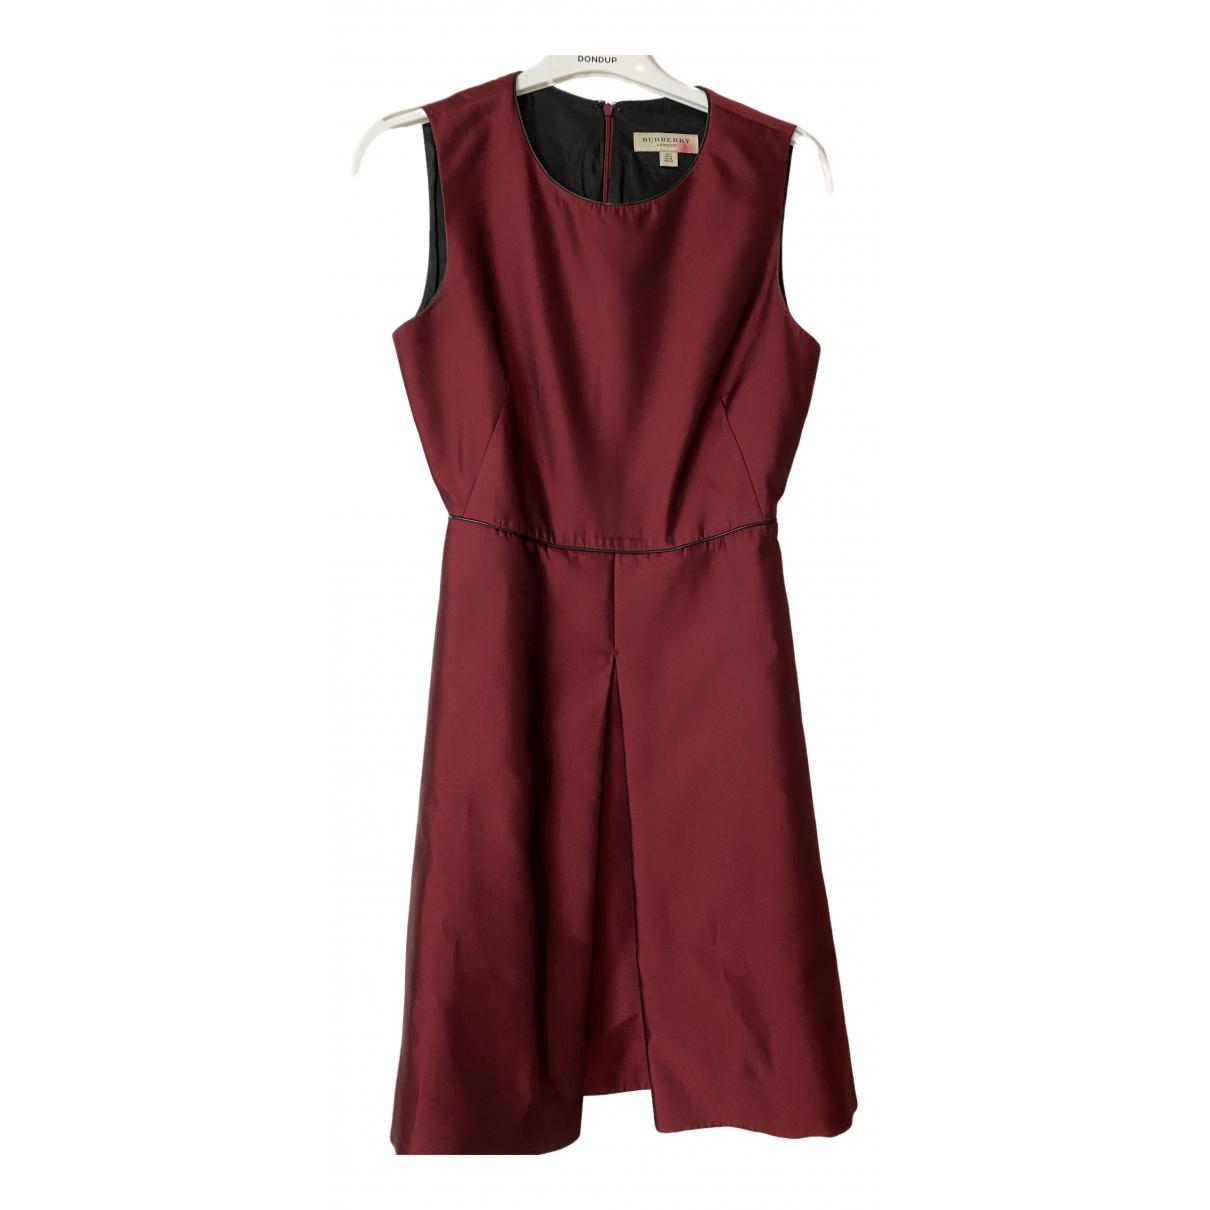 Burberry \N Kleid in  Bordeauxrot Polyester